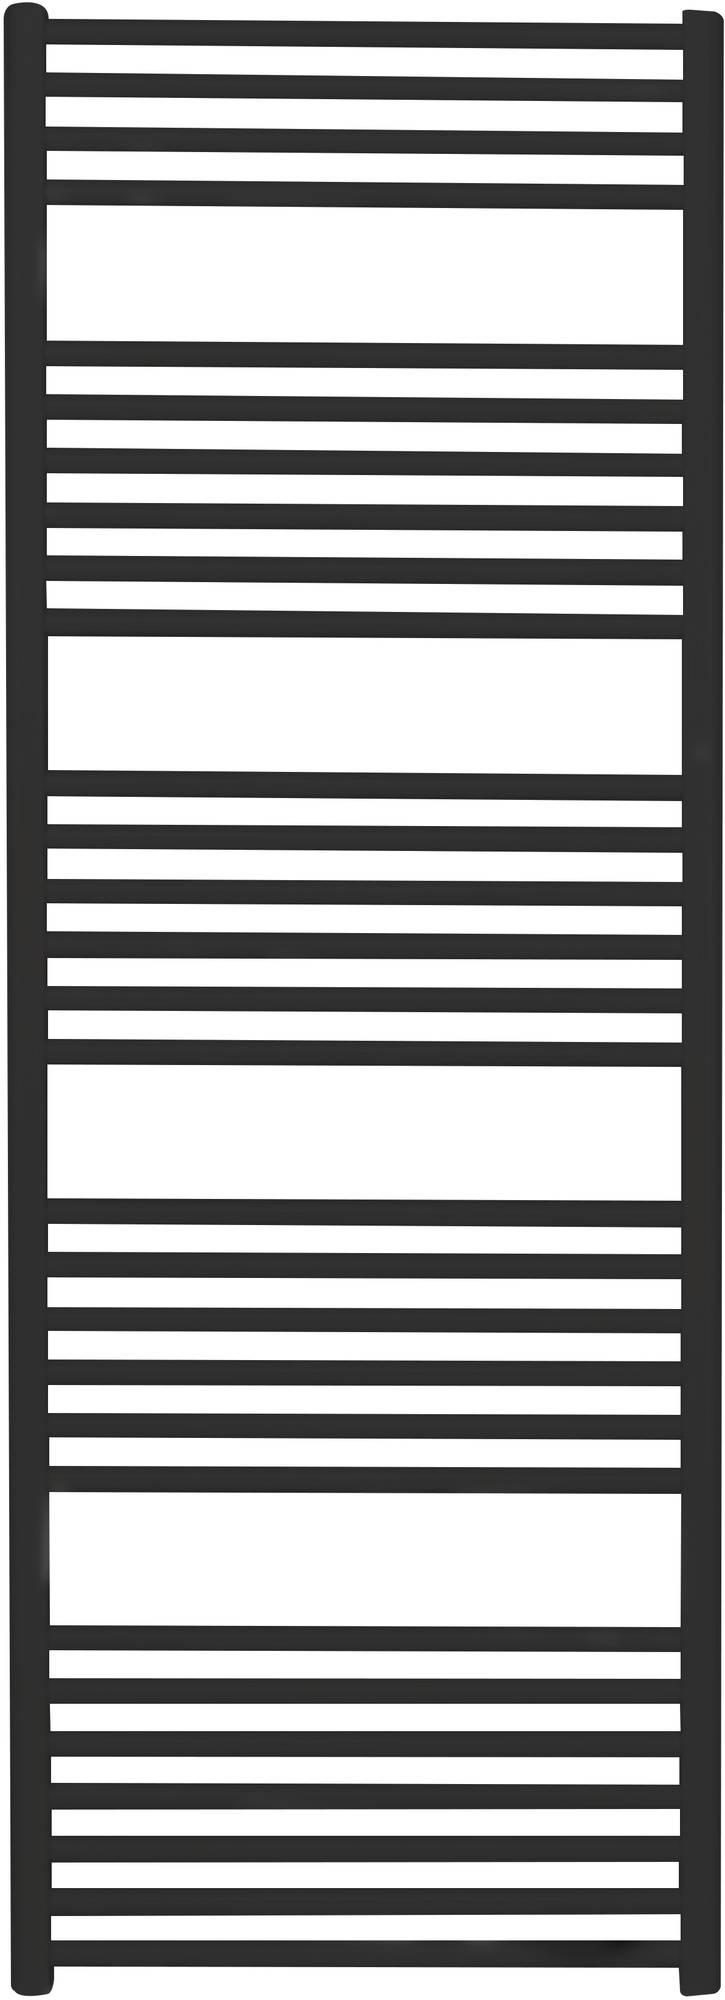 Saniselect Moulin Designradiatoren Recht 60x167,2 cm Zwart